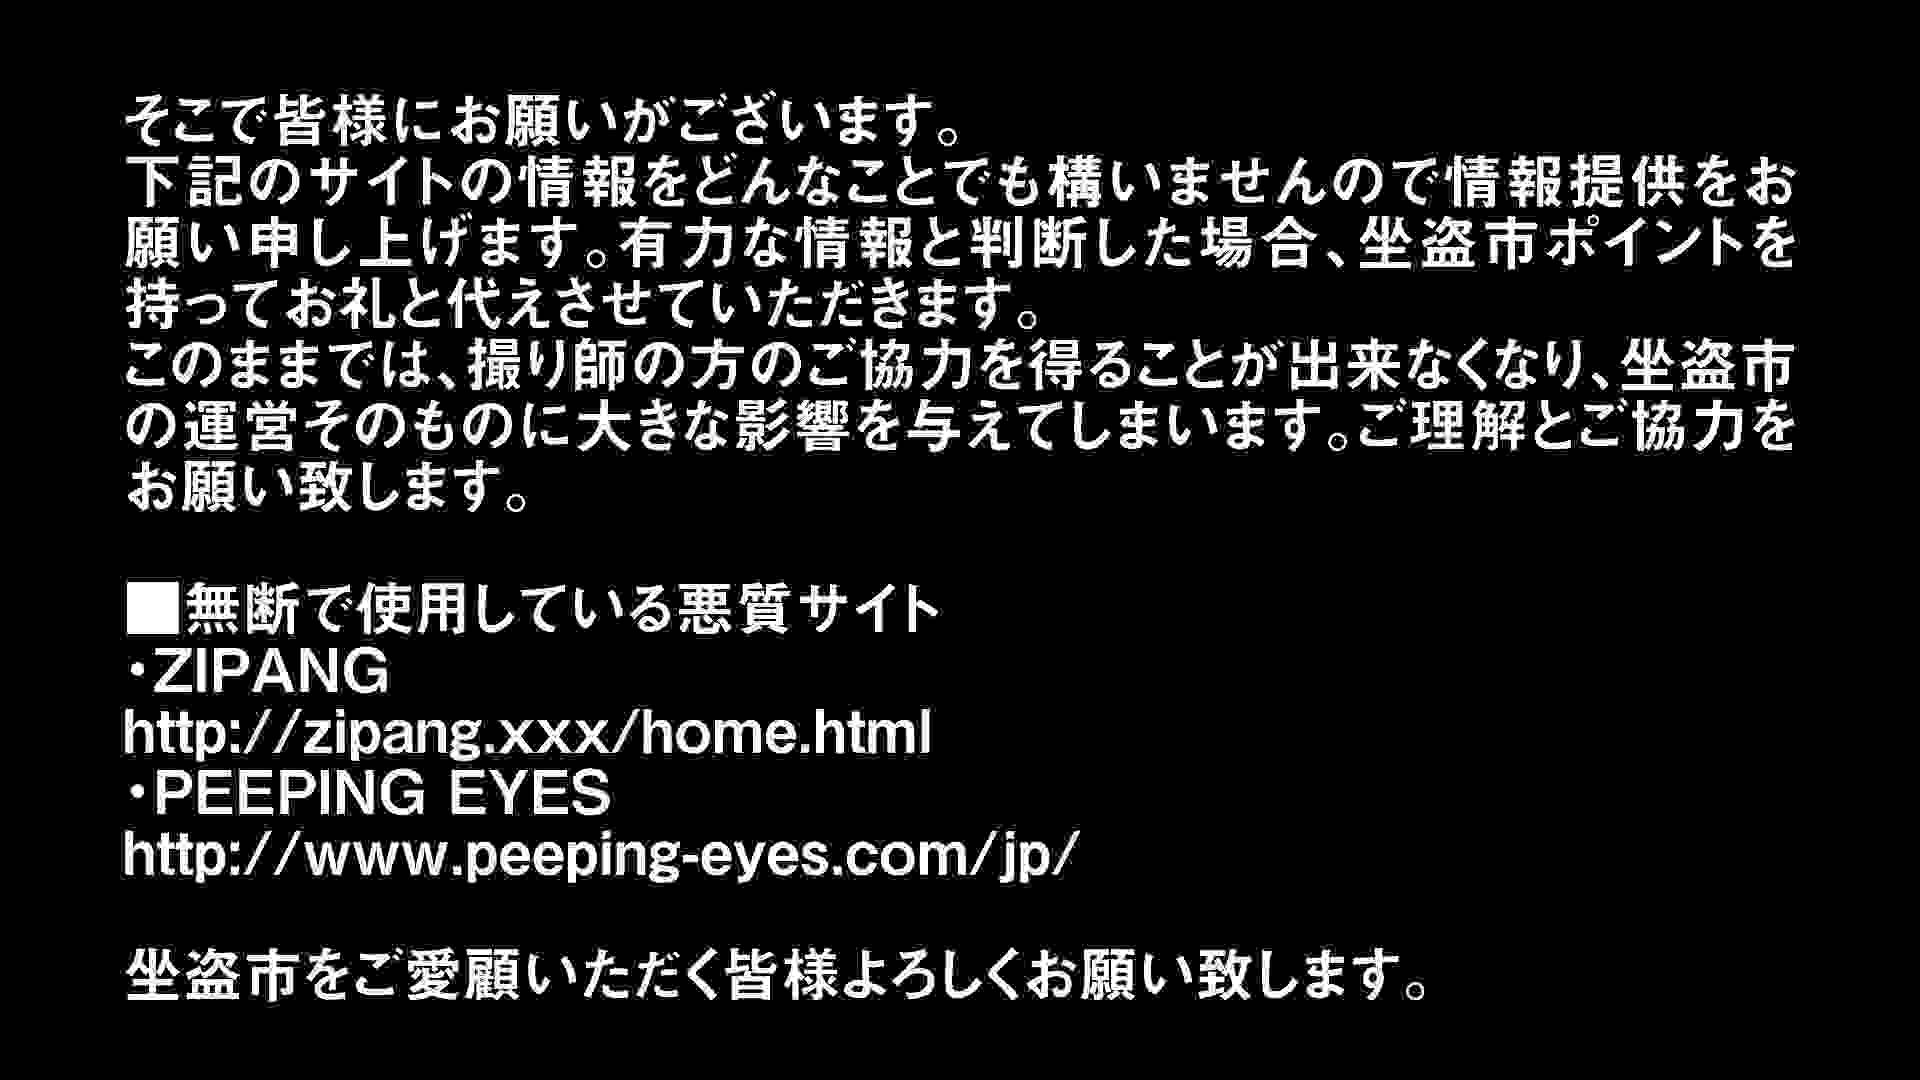 Aquaな露天風呂Vol.304 露天風呂編  85PIX 2